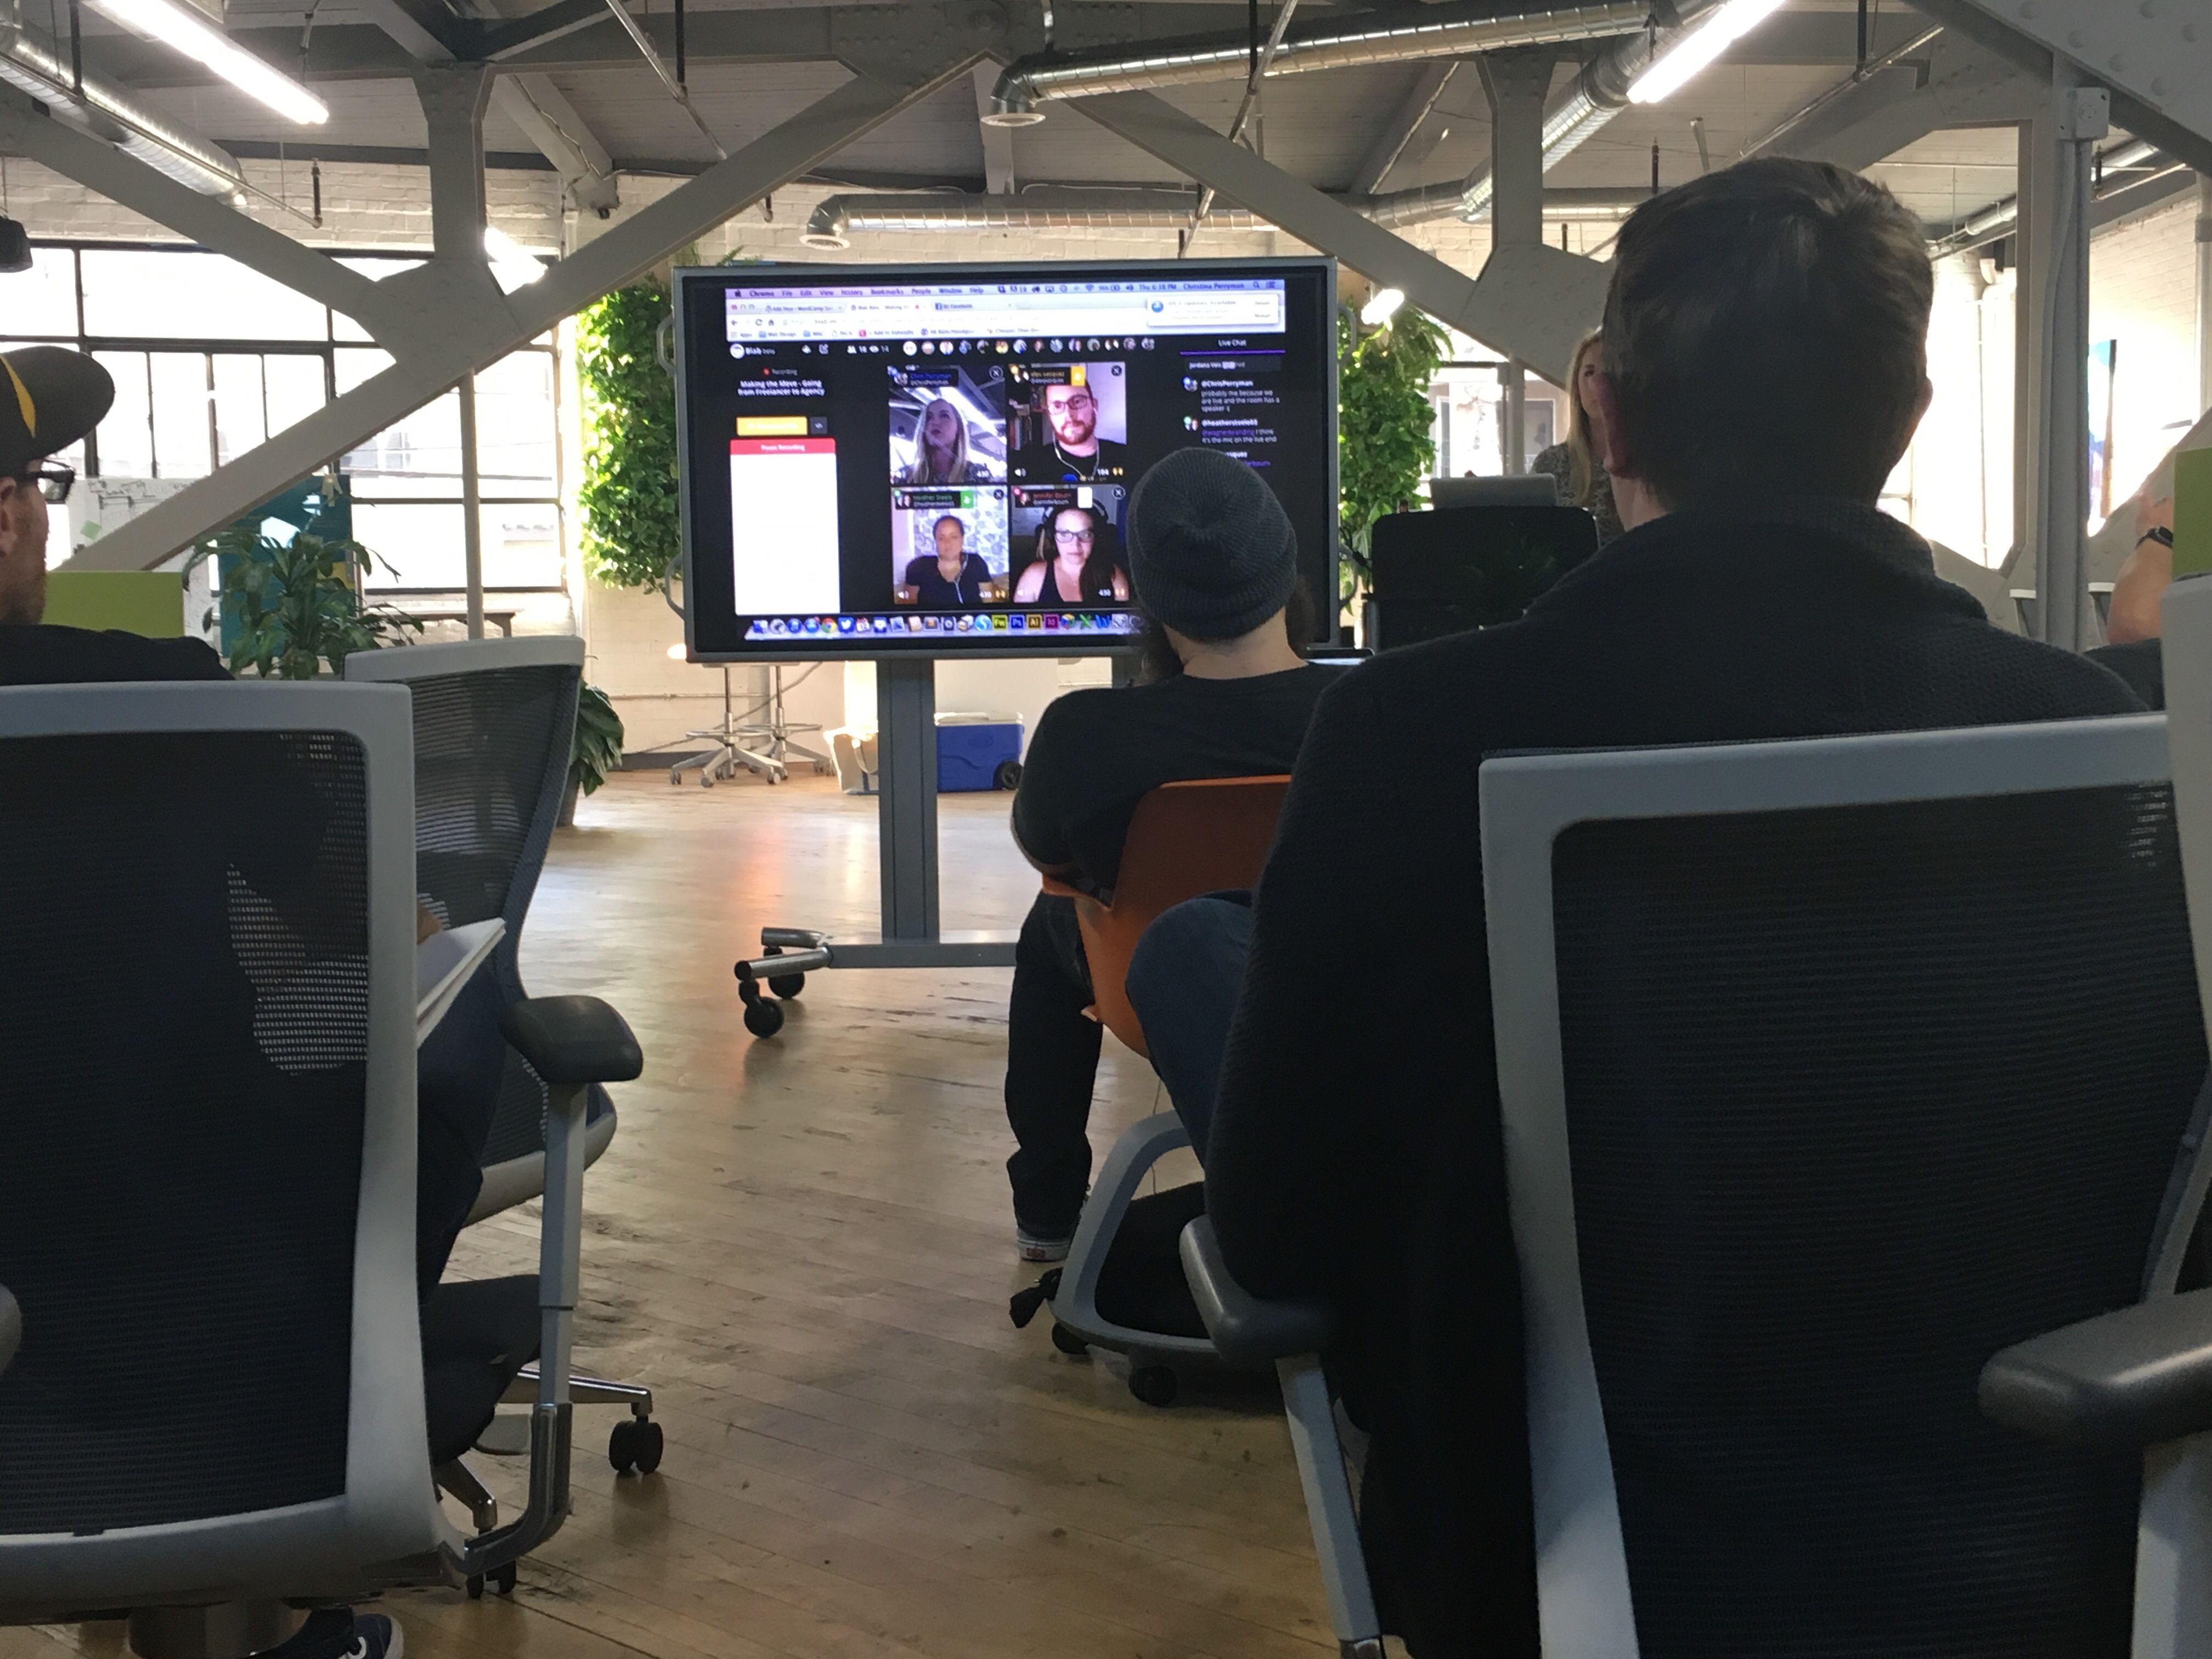 San Diego WordPress Meetup (formerly Advanced WordPress)